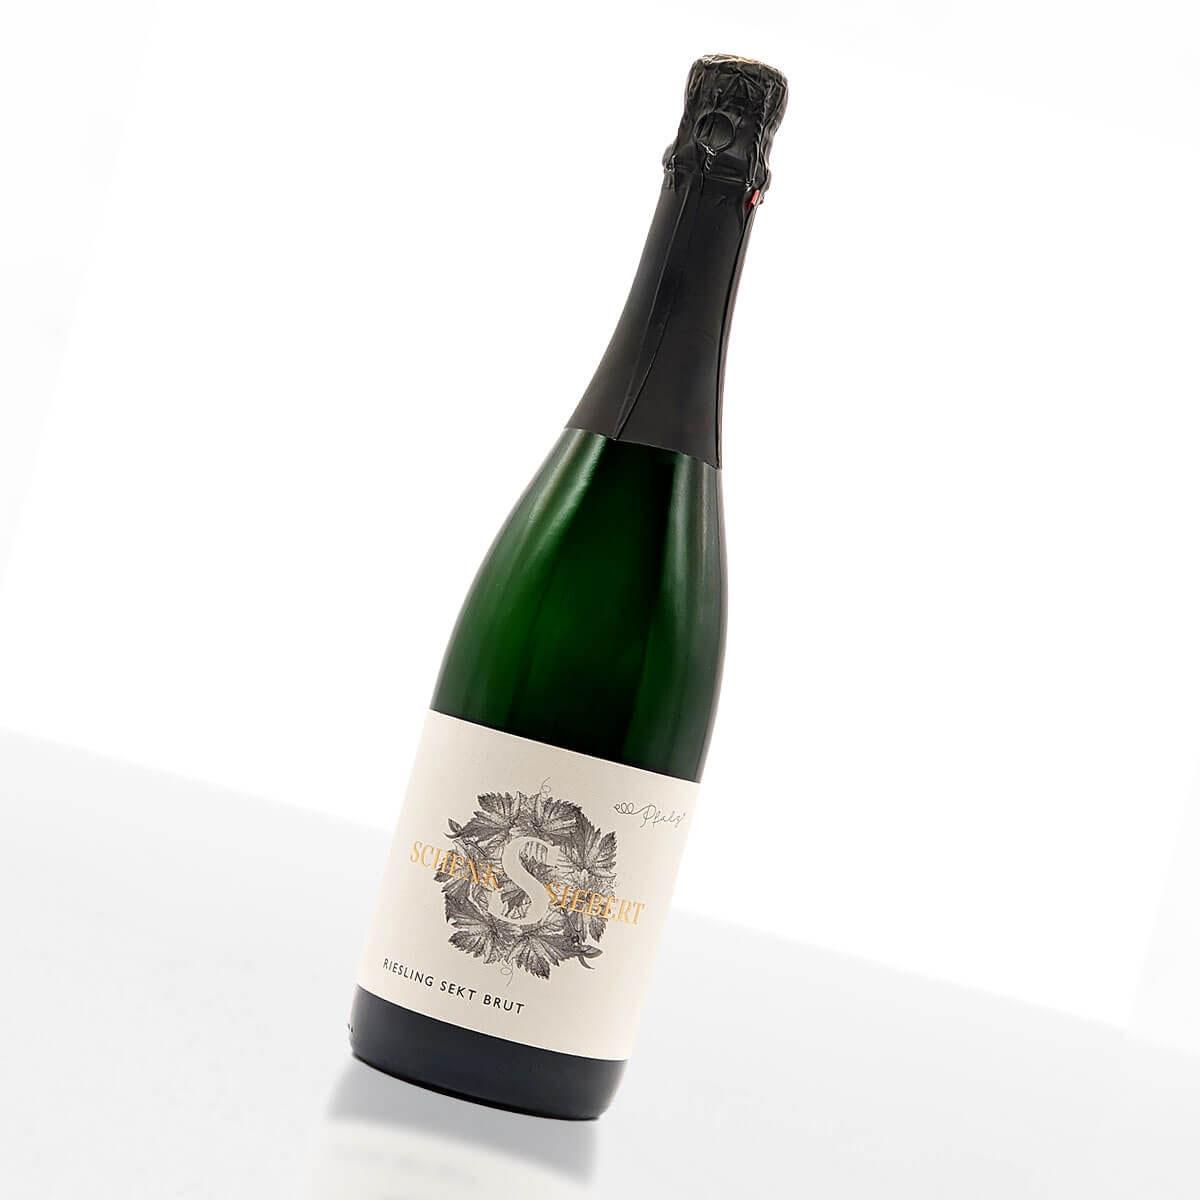 Riesling Sekt Brut trocken • Weingut Schenk-Siebert